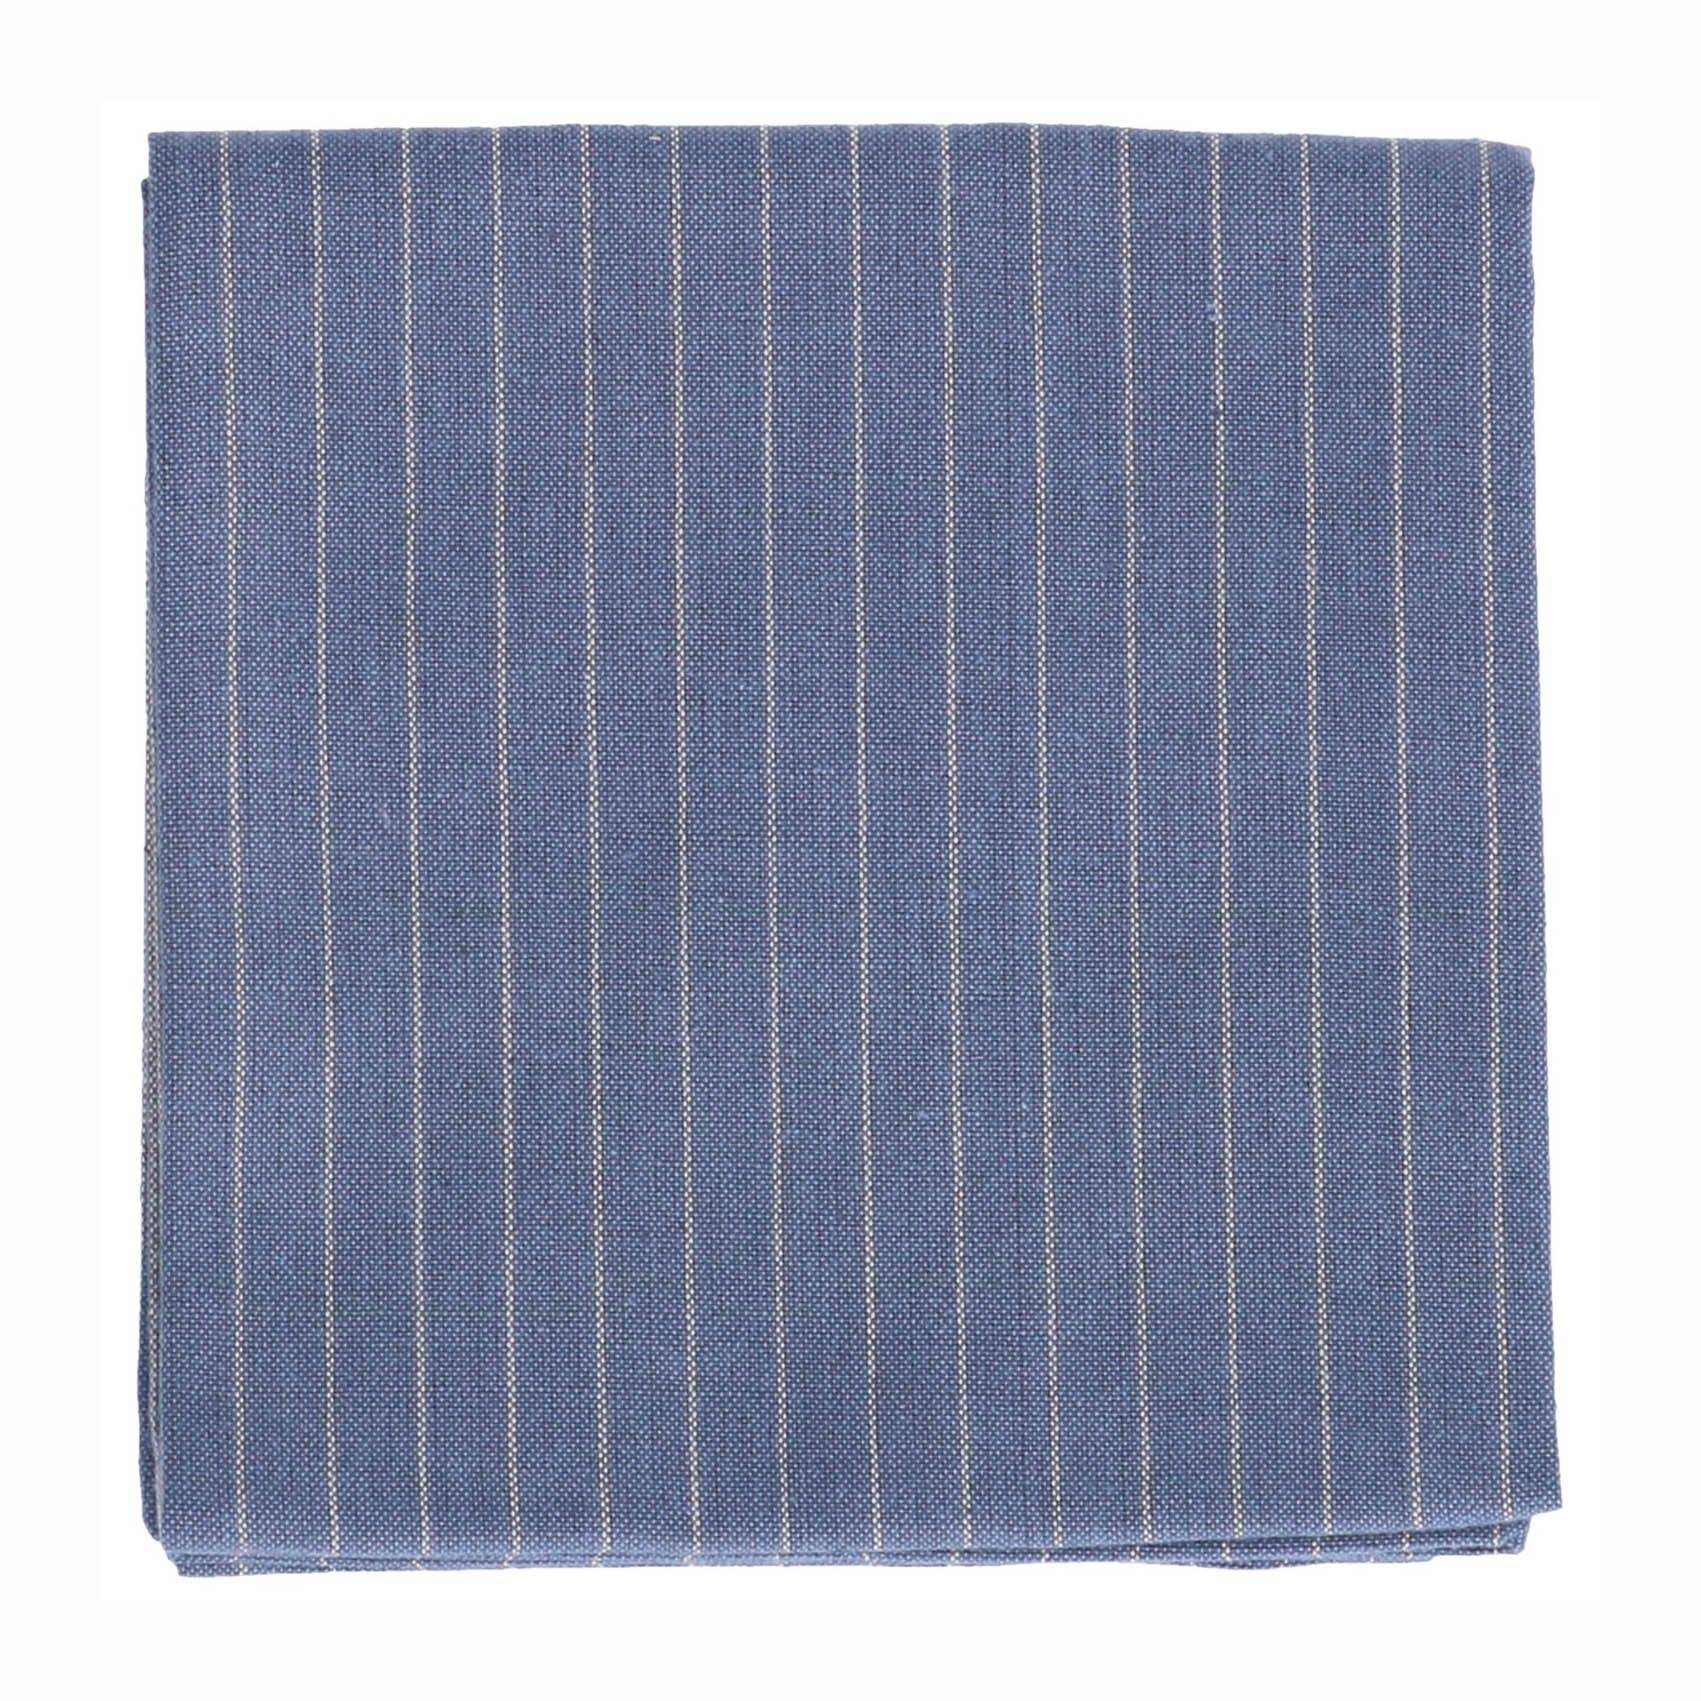 Dille&Kamille Torchon, coton bio, bleu denim, rayures, 50x70 cm